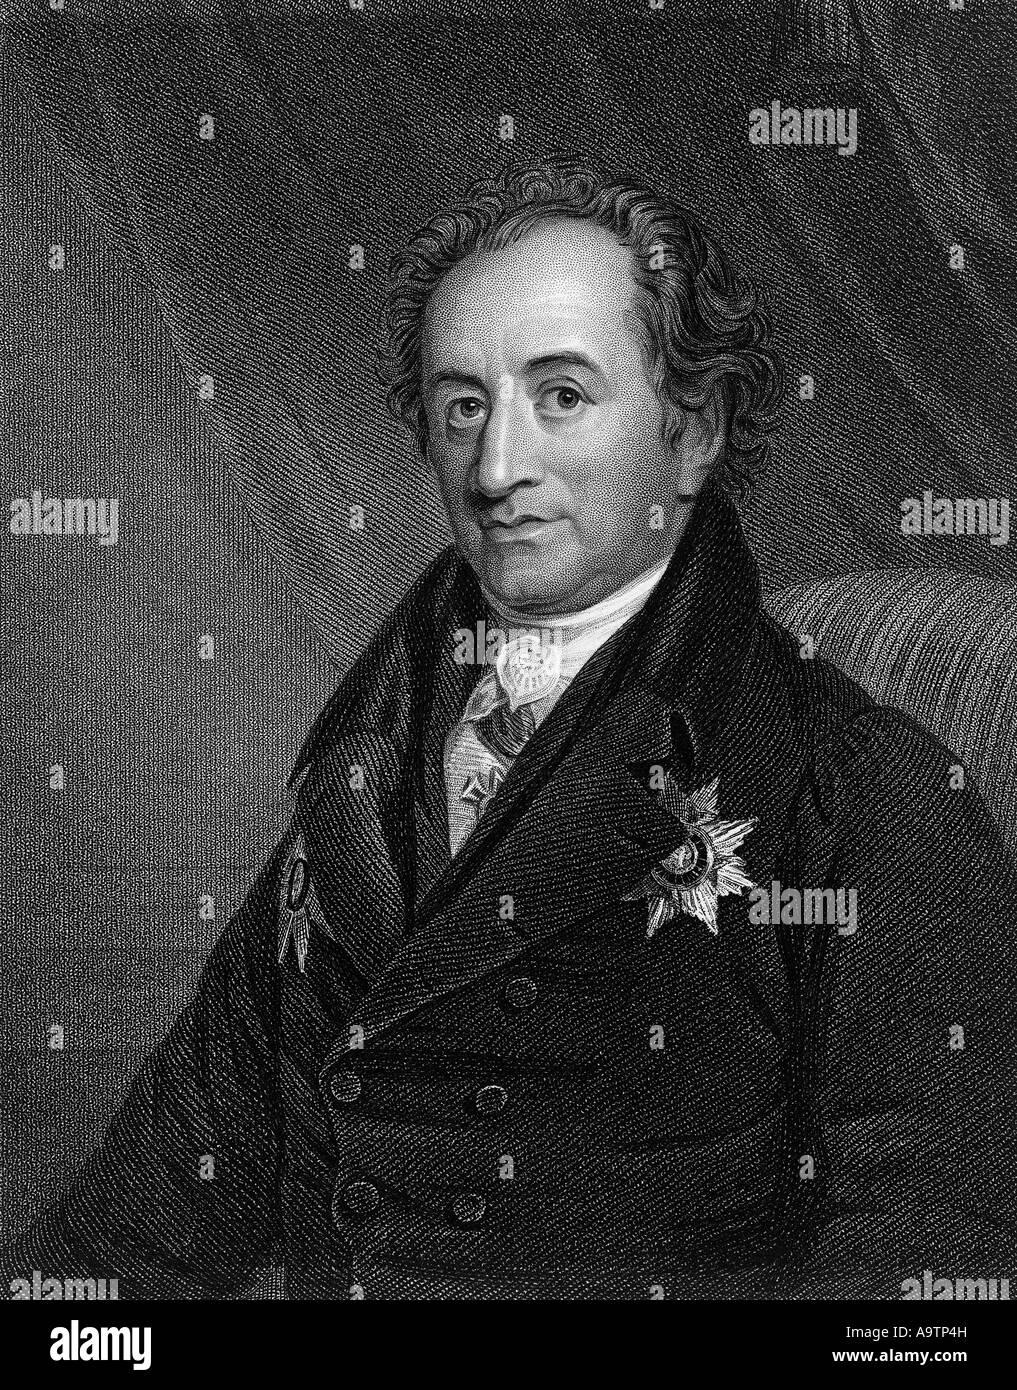 JOHANN WOLFGANG VON GOETHE  (1749-1832 German writer and scientist - Stock Image